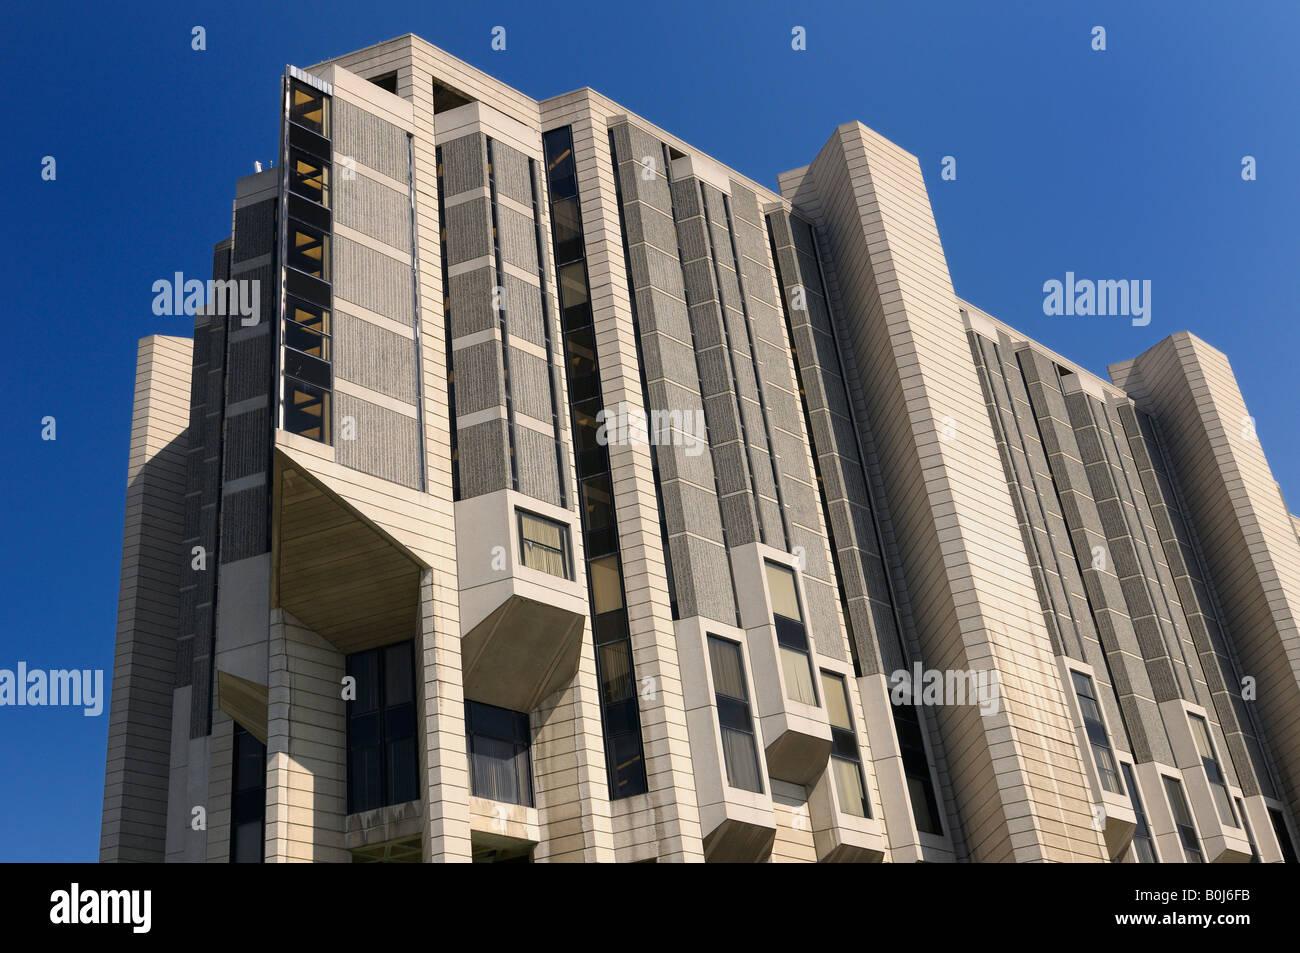 Futurist Architecture Stock Photos & Futurist Architecture Stock ...